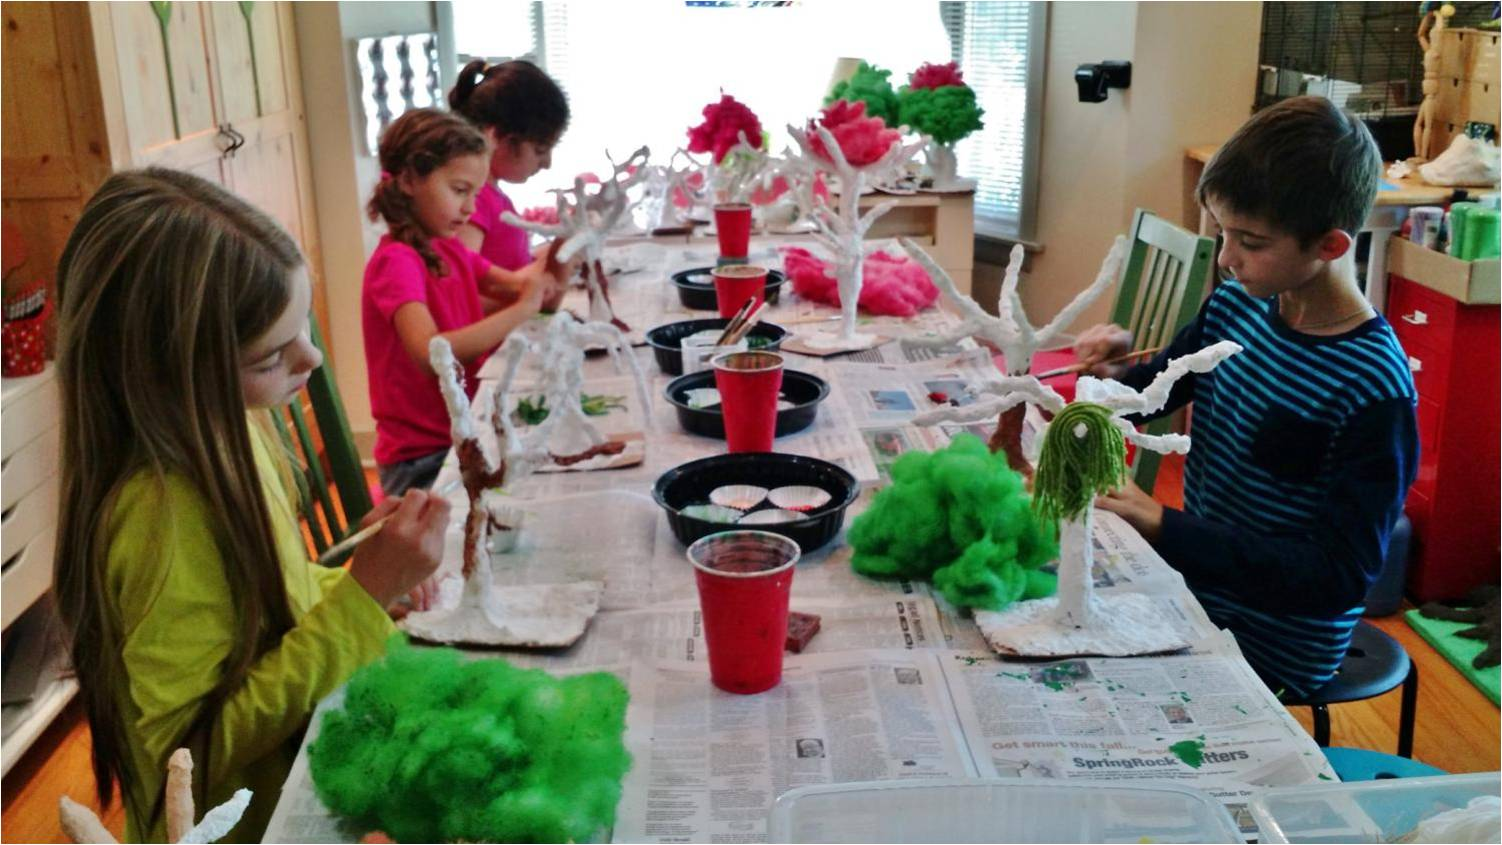 pm trees photo kids painting.jpg